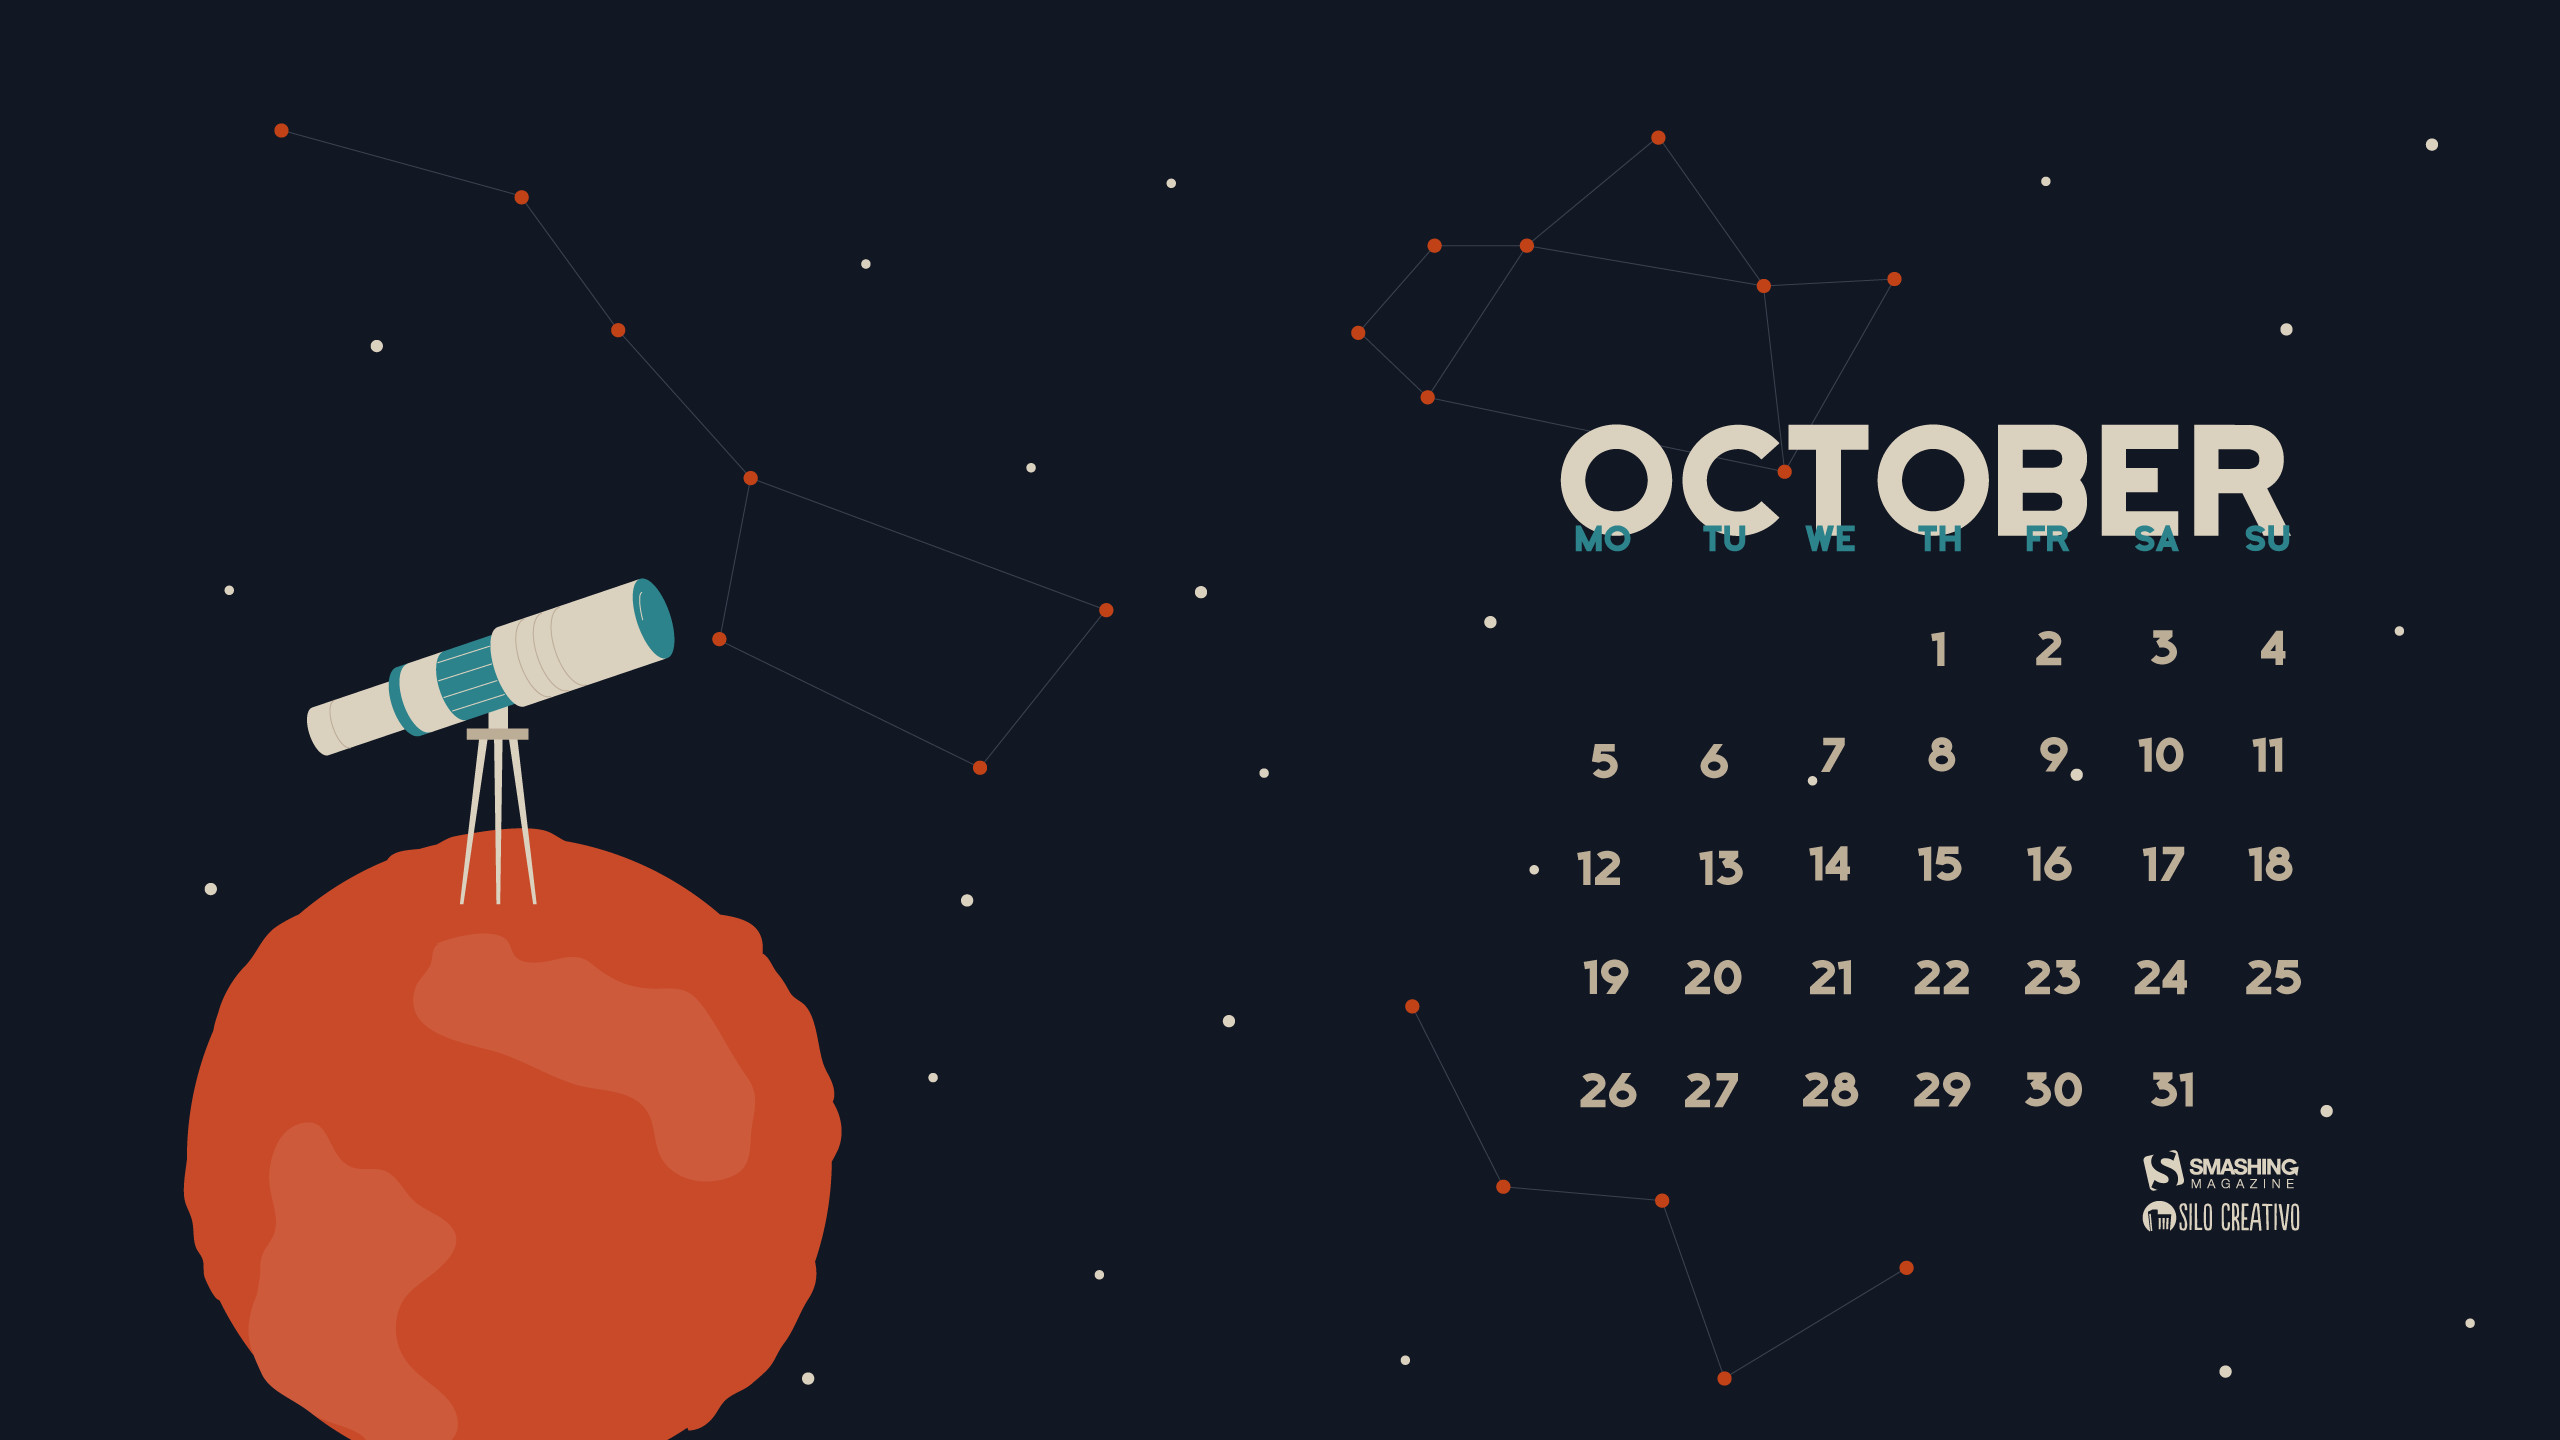 Desktop Wallpapers Calendar July 2018 2560x1440